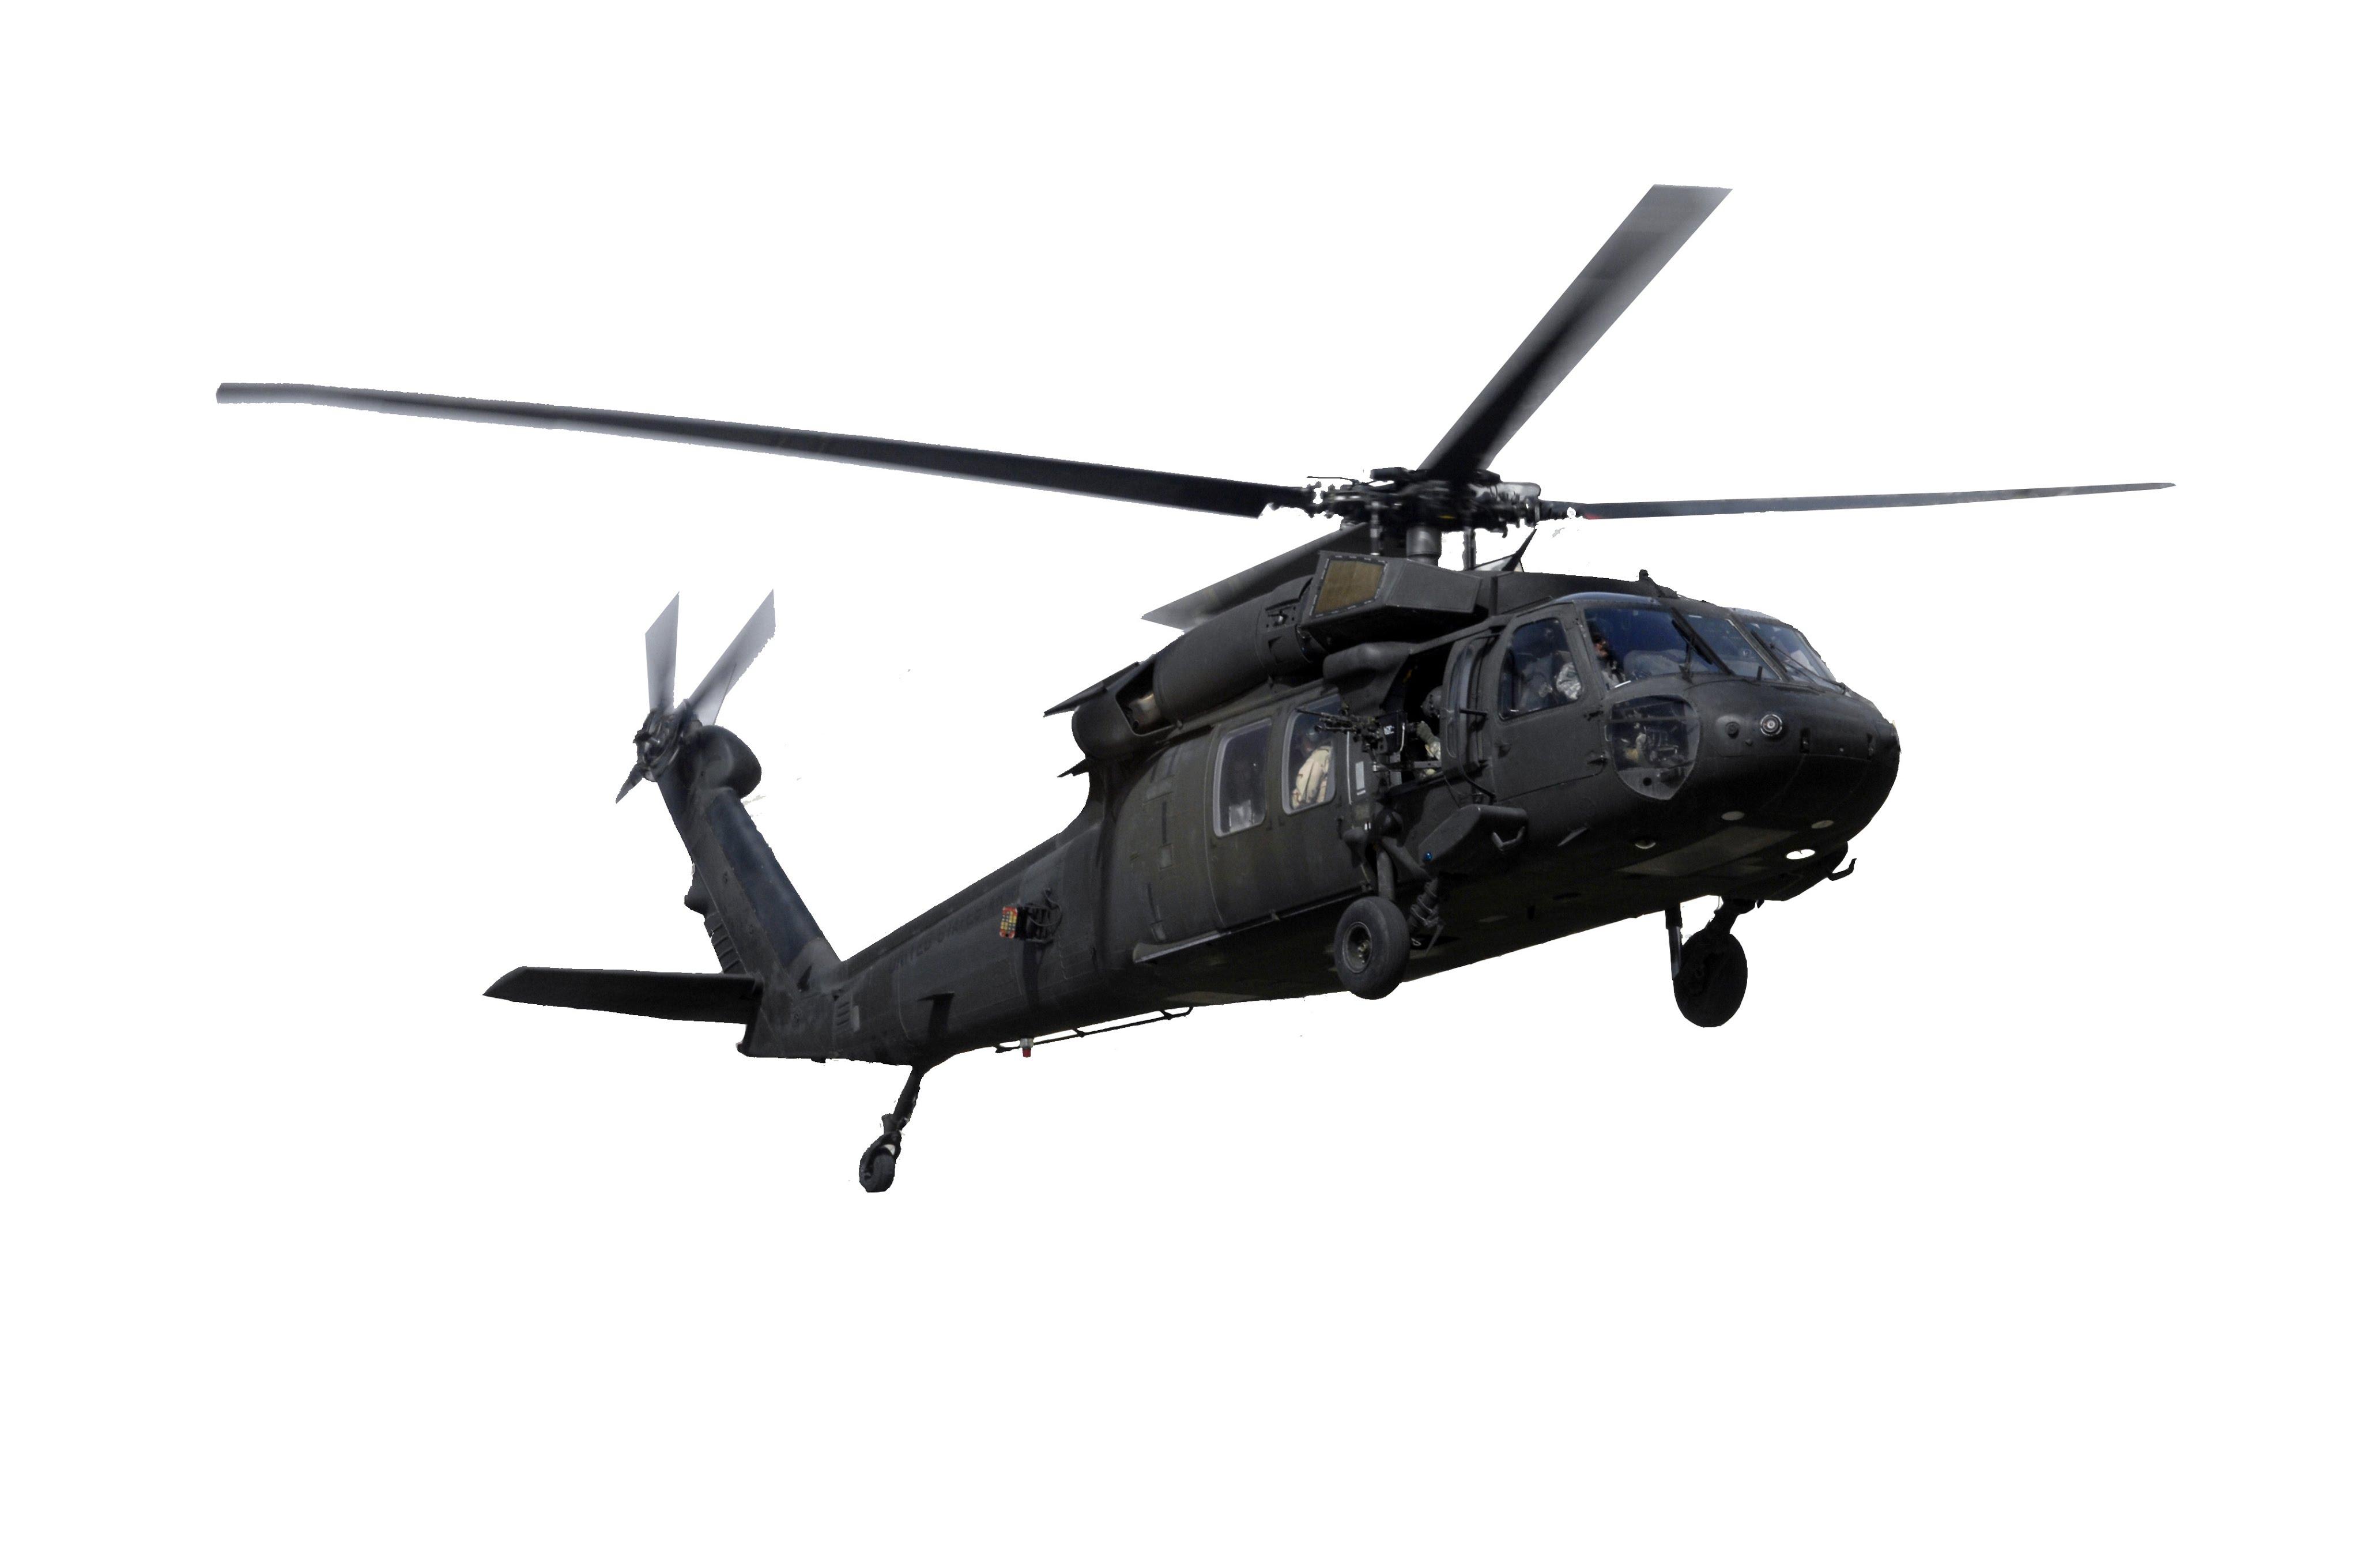 2016 Rhode Island Air Show UH-60 Black Hawk Helicopter Flight 6-11 ...